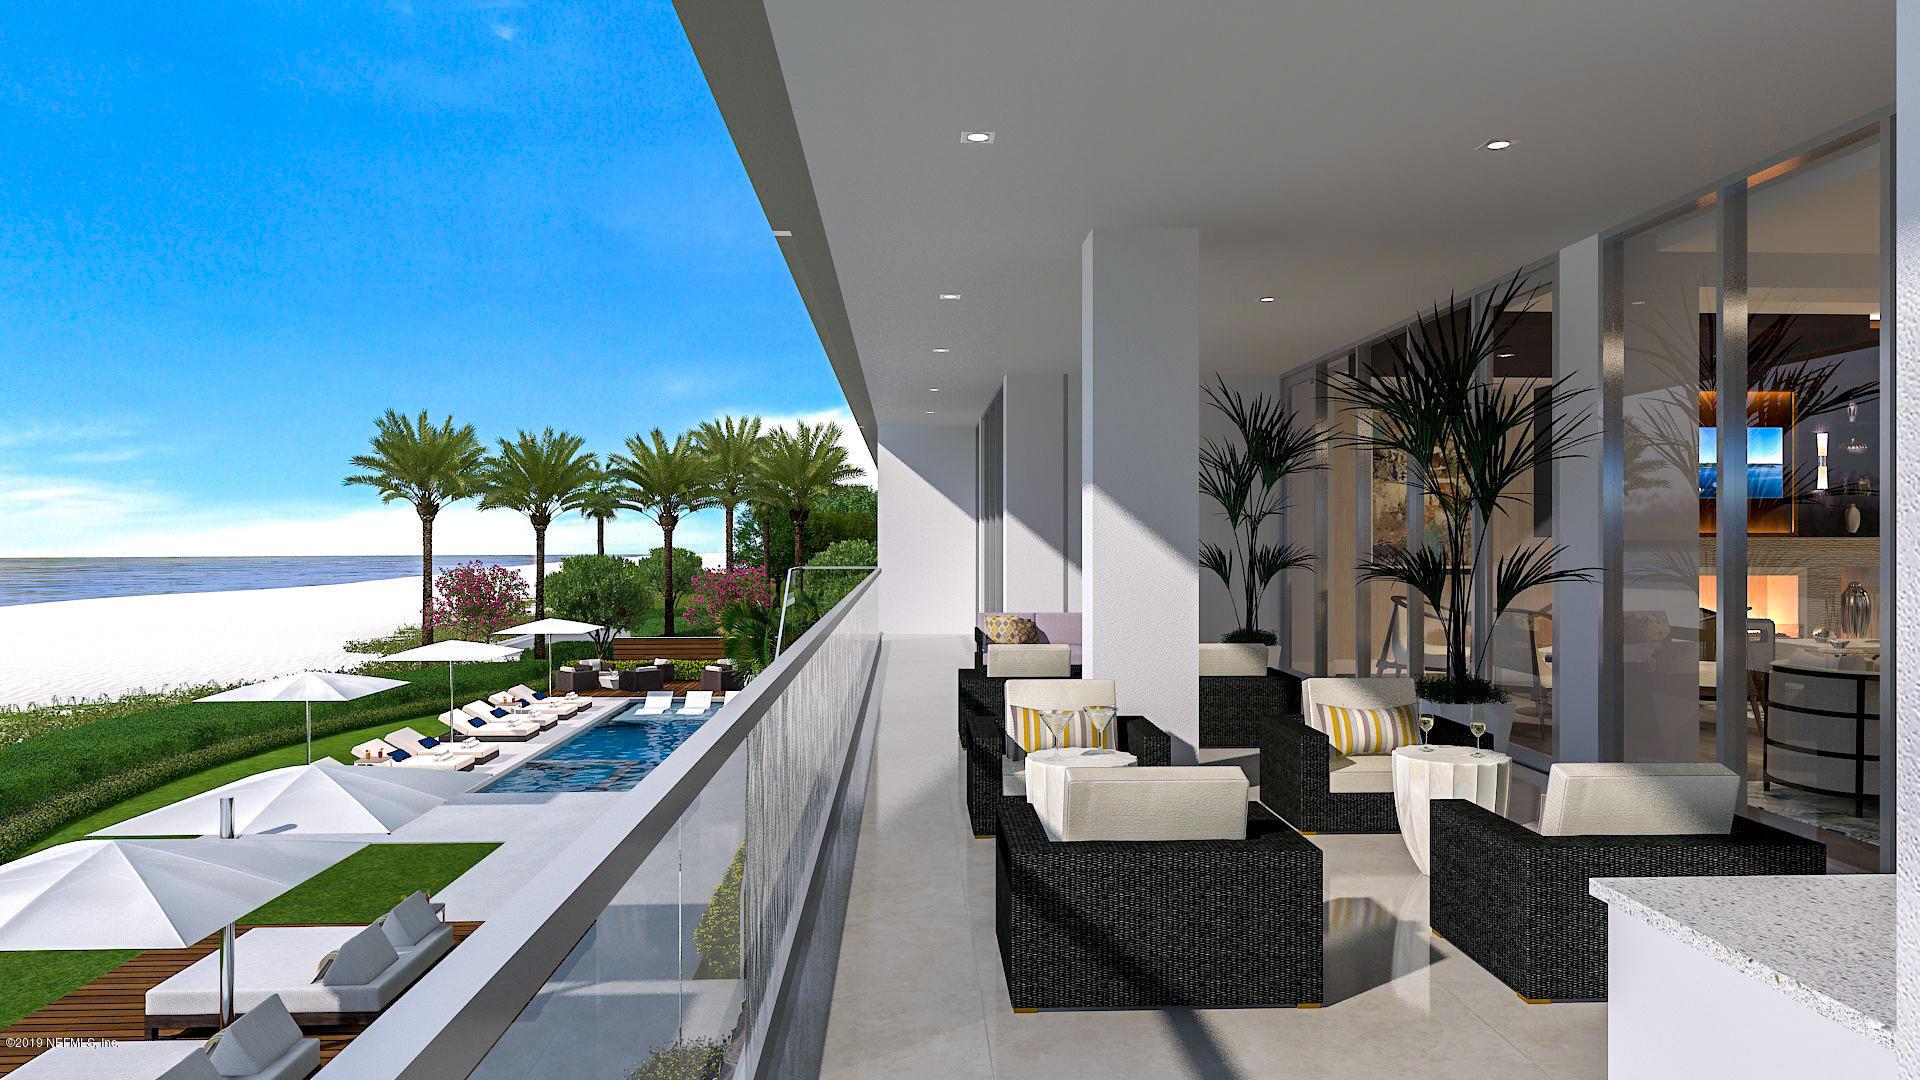 1401 1ST- JACKSONVILLE BEACH- FLORIDA 32250, 3 Bedrooms Bedrooms, ,3 BathroomsBathrooms,Condo,For sale,1ST,1018263